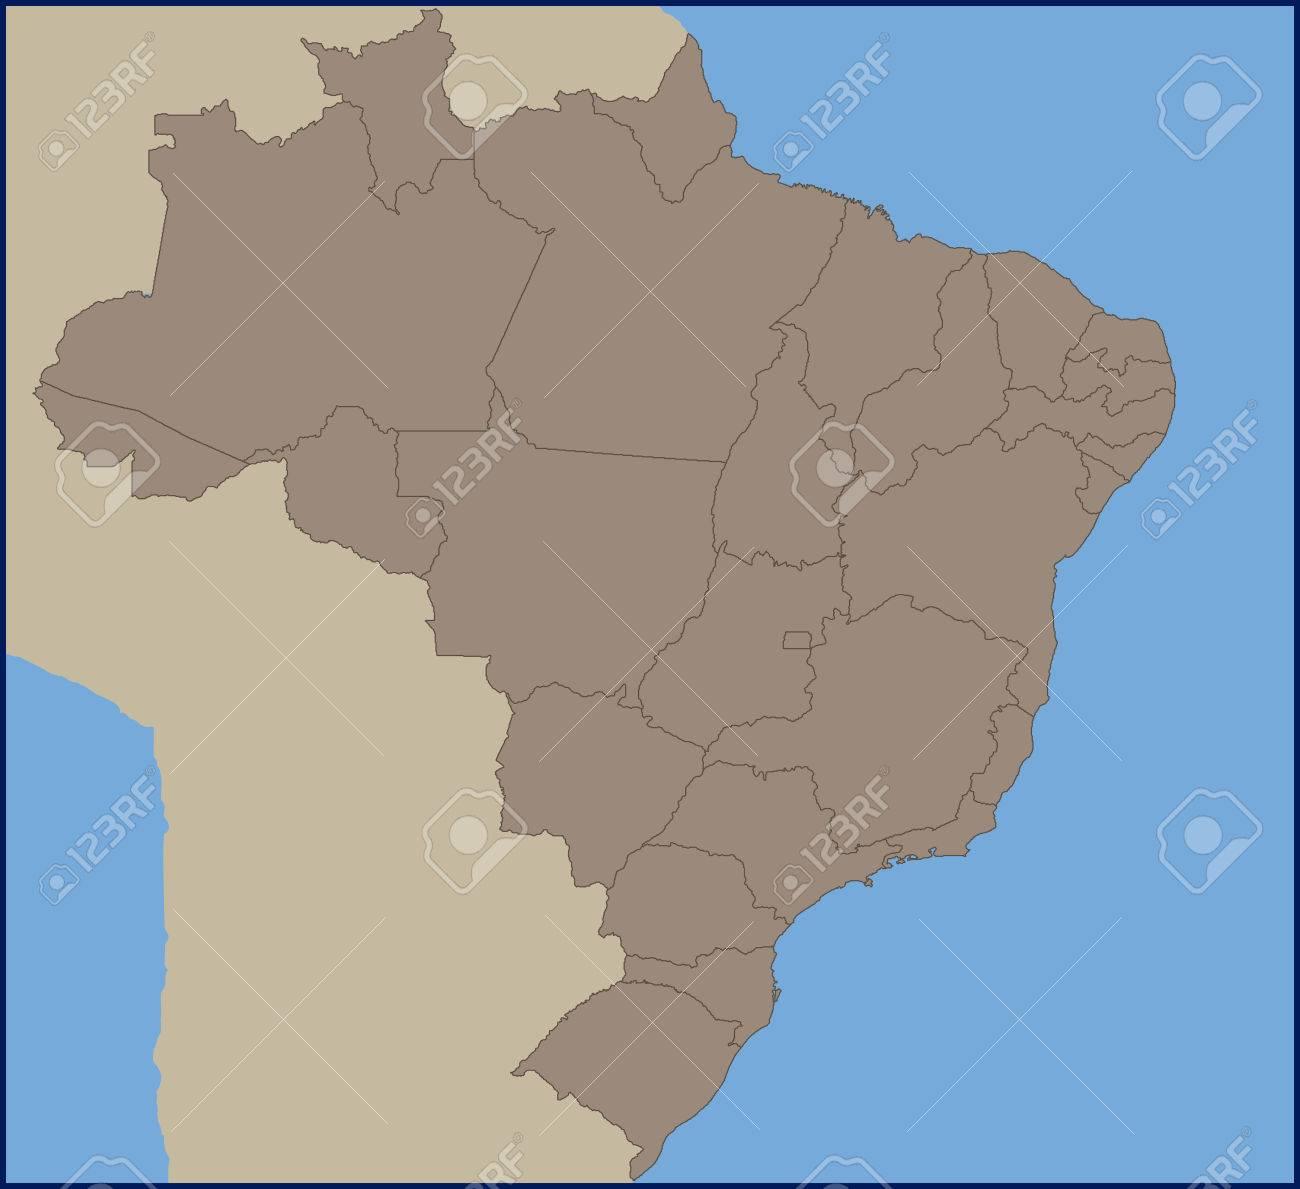 Empty Political Map of Brazil